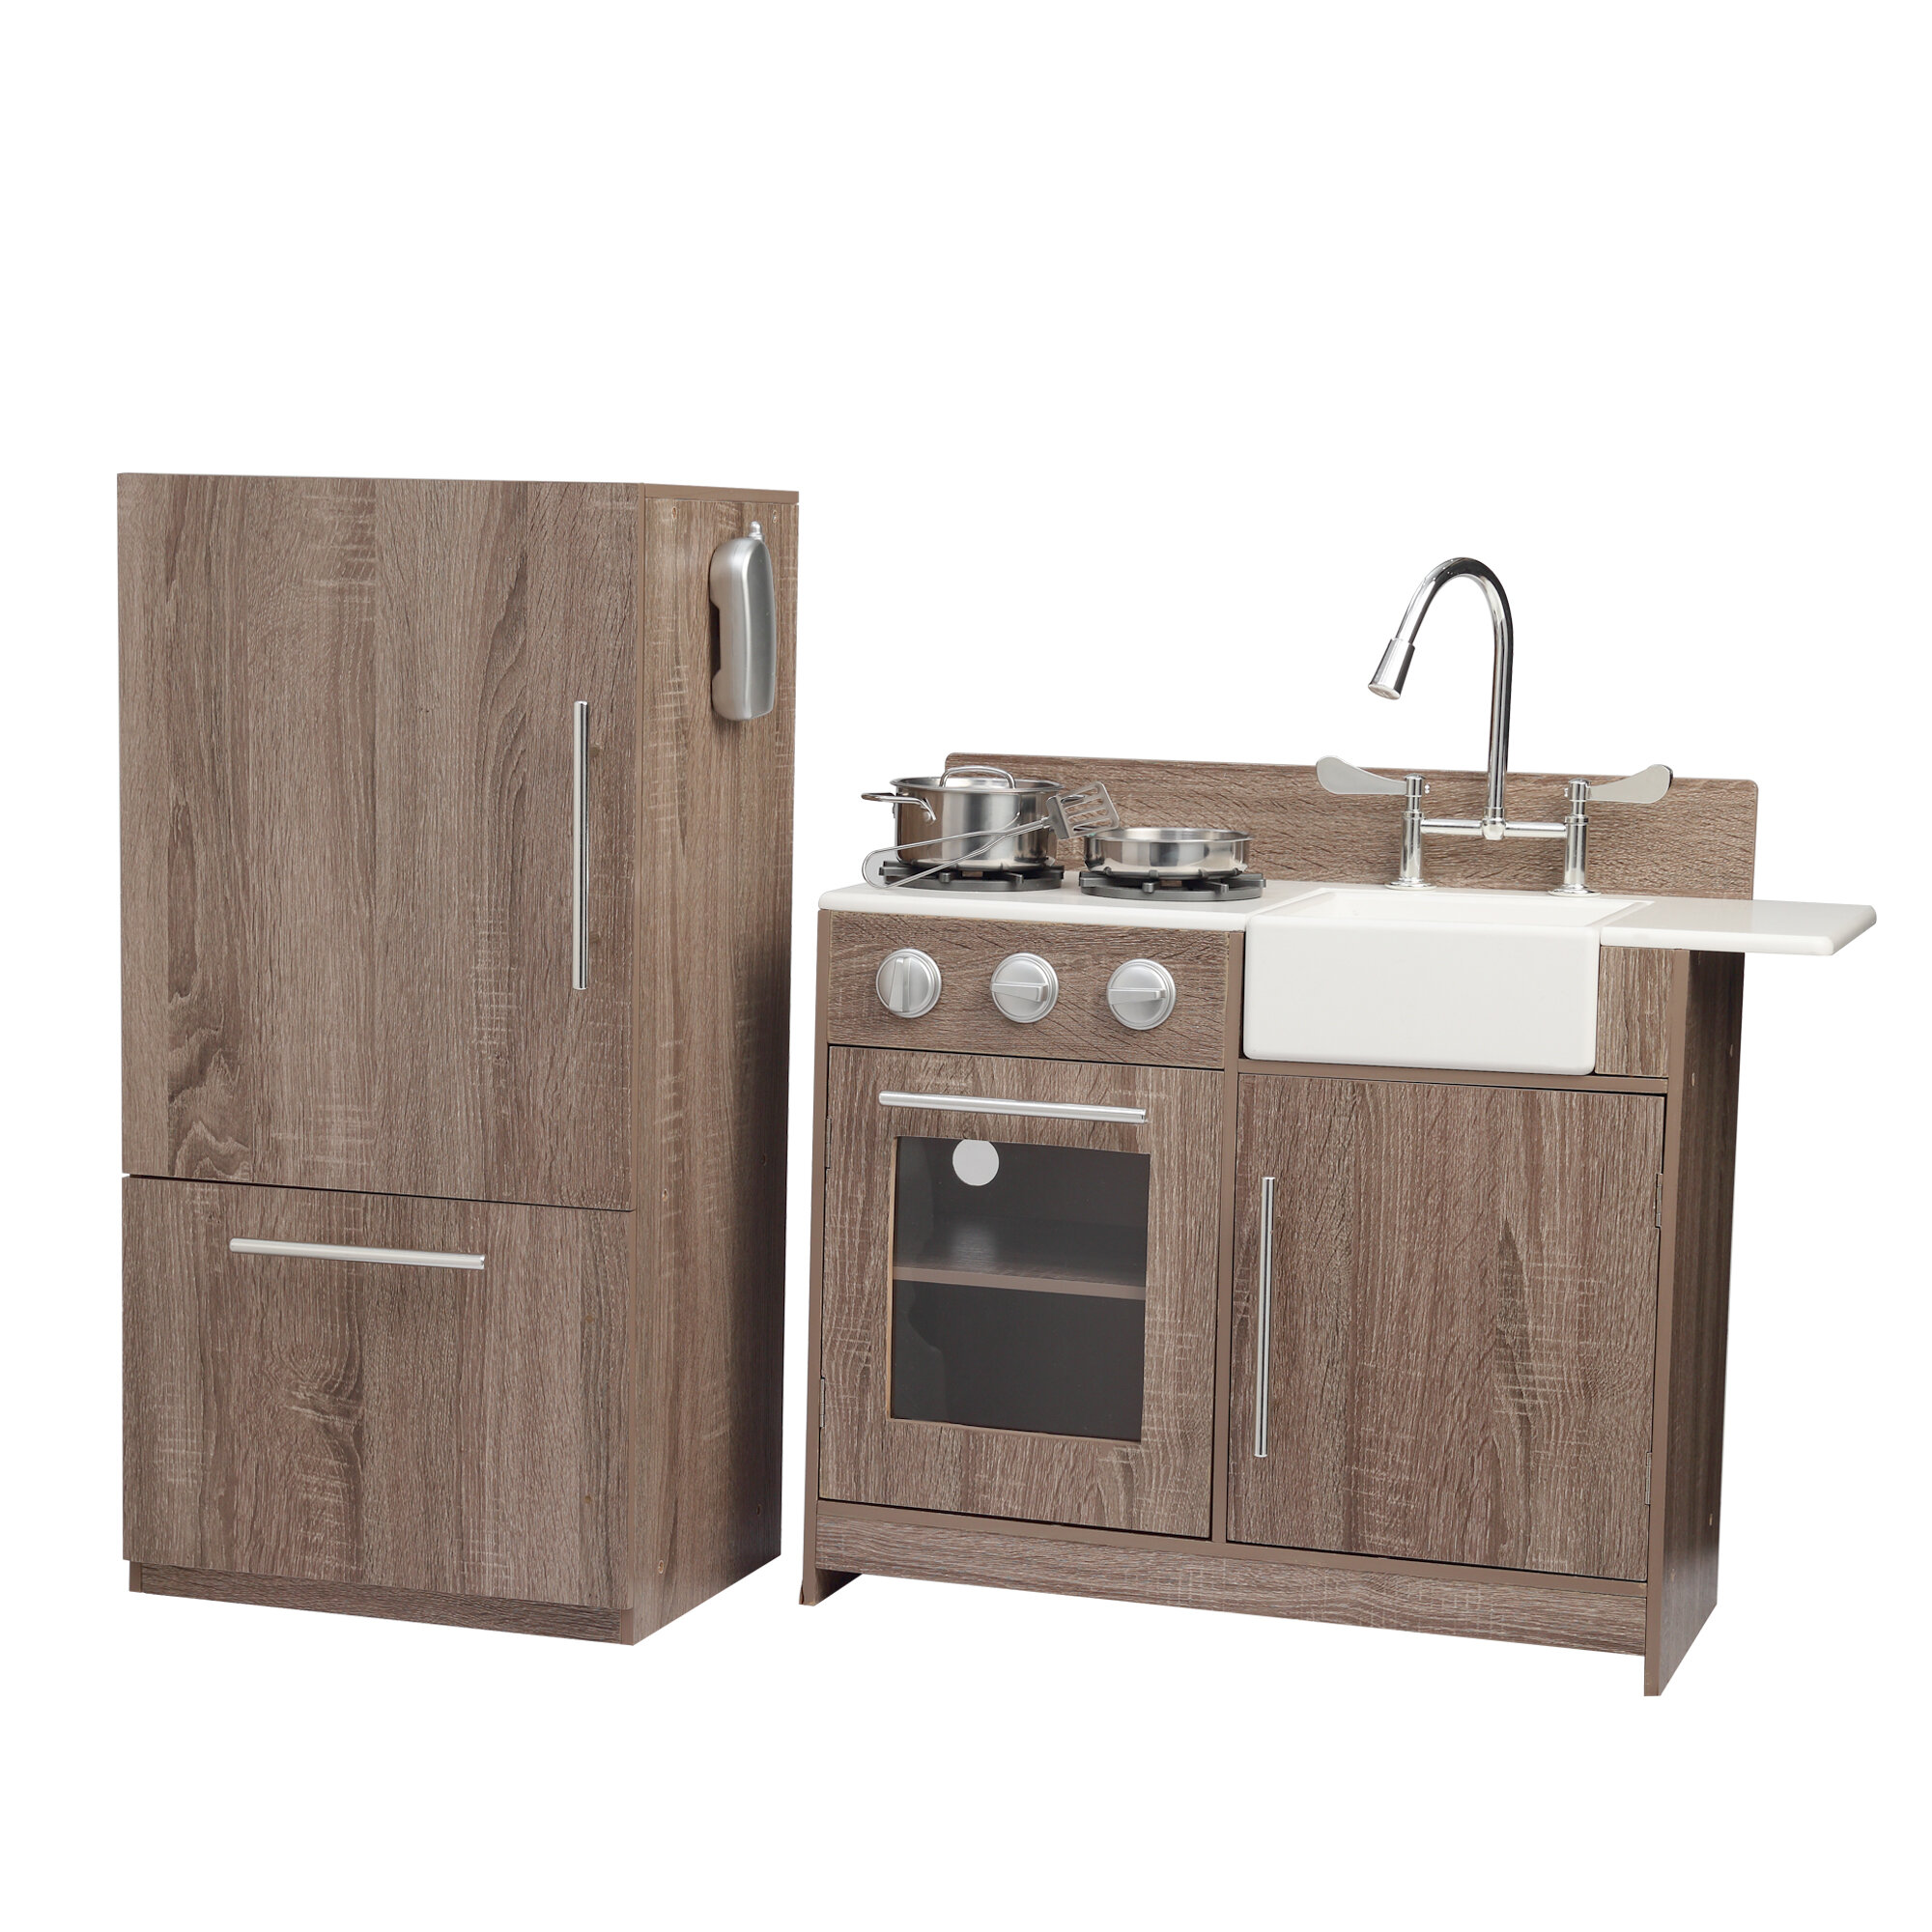 2 piece soho big play kitchen set reviews joss main